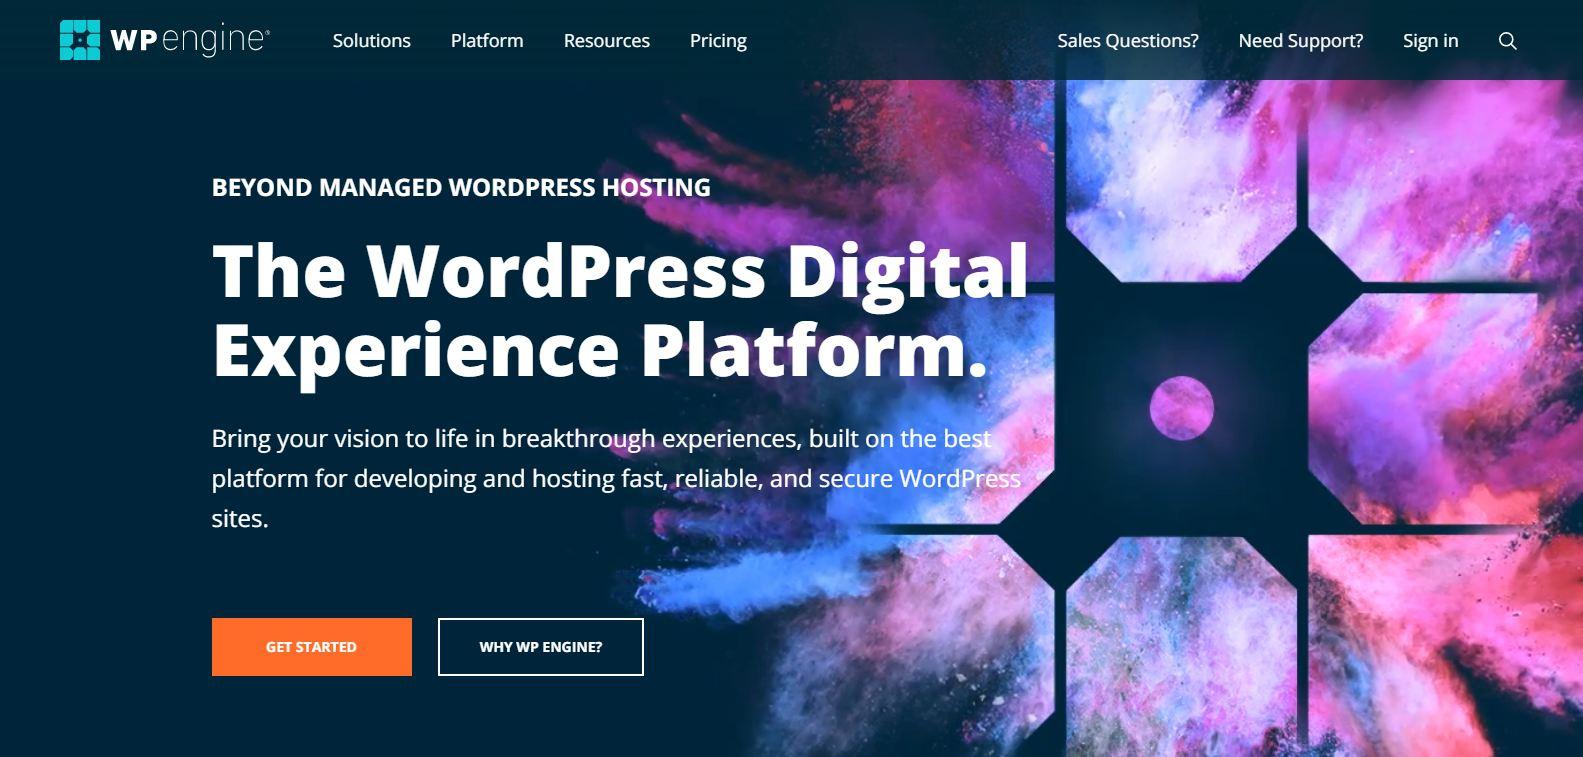 wpengine Enterprise Managed WordPress Hosting